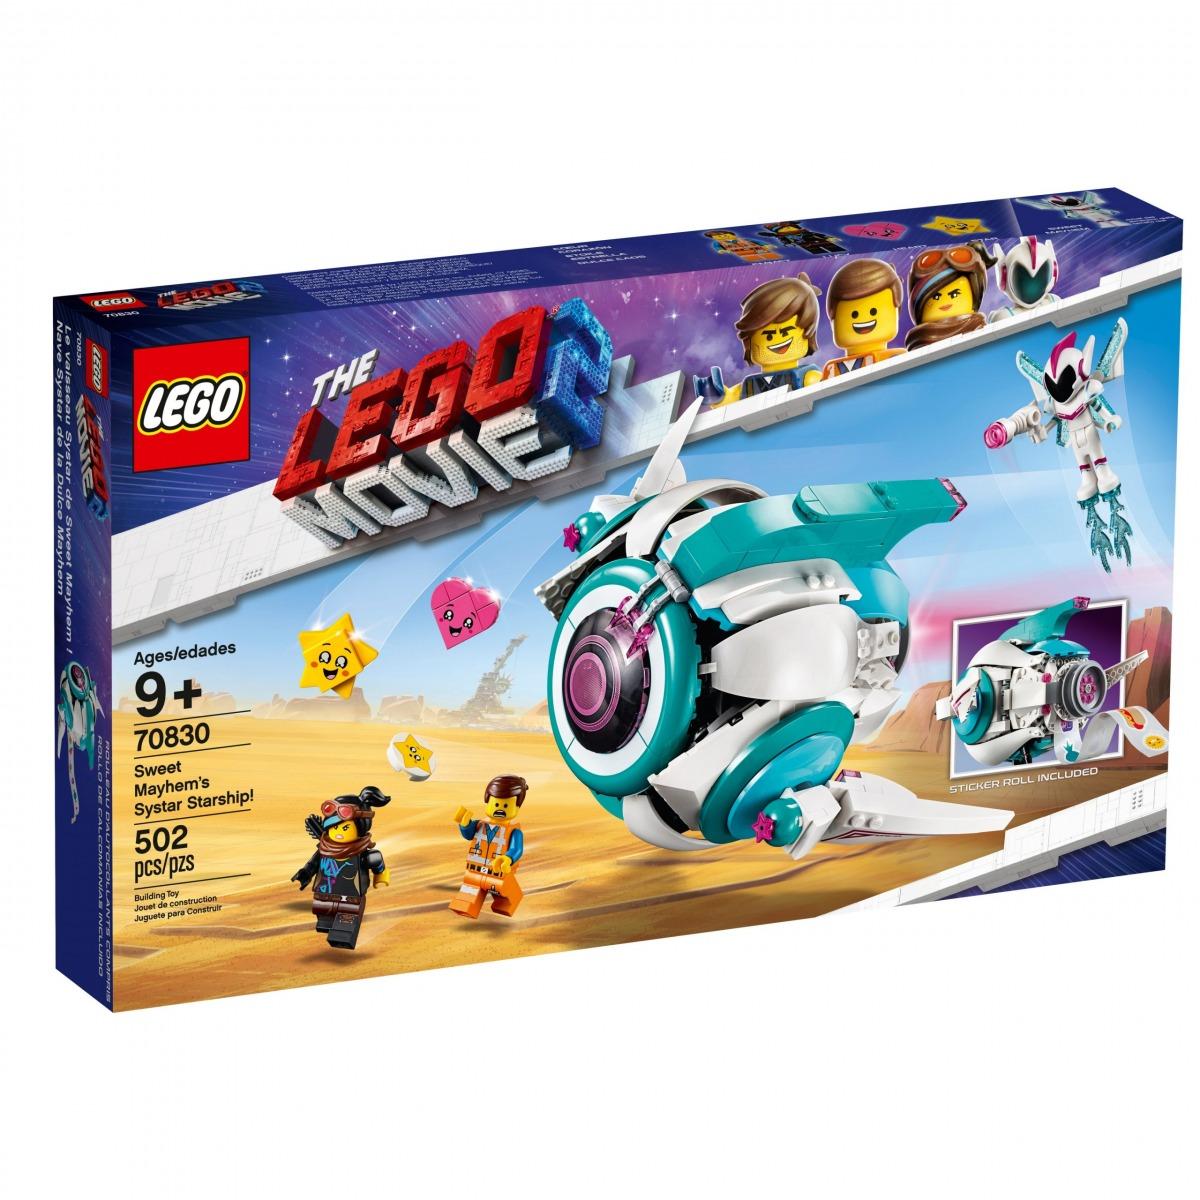 lego 70830 sweet mayhems systar starship scaled